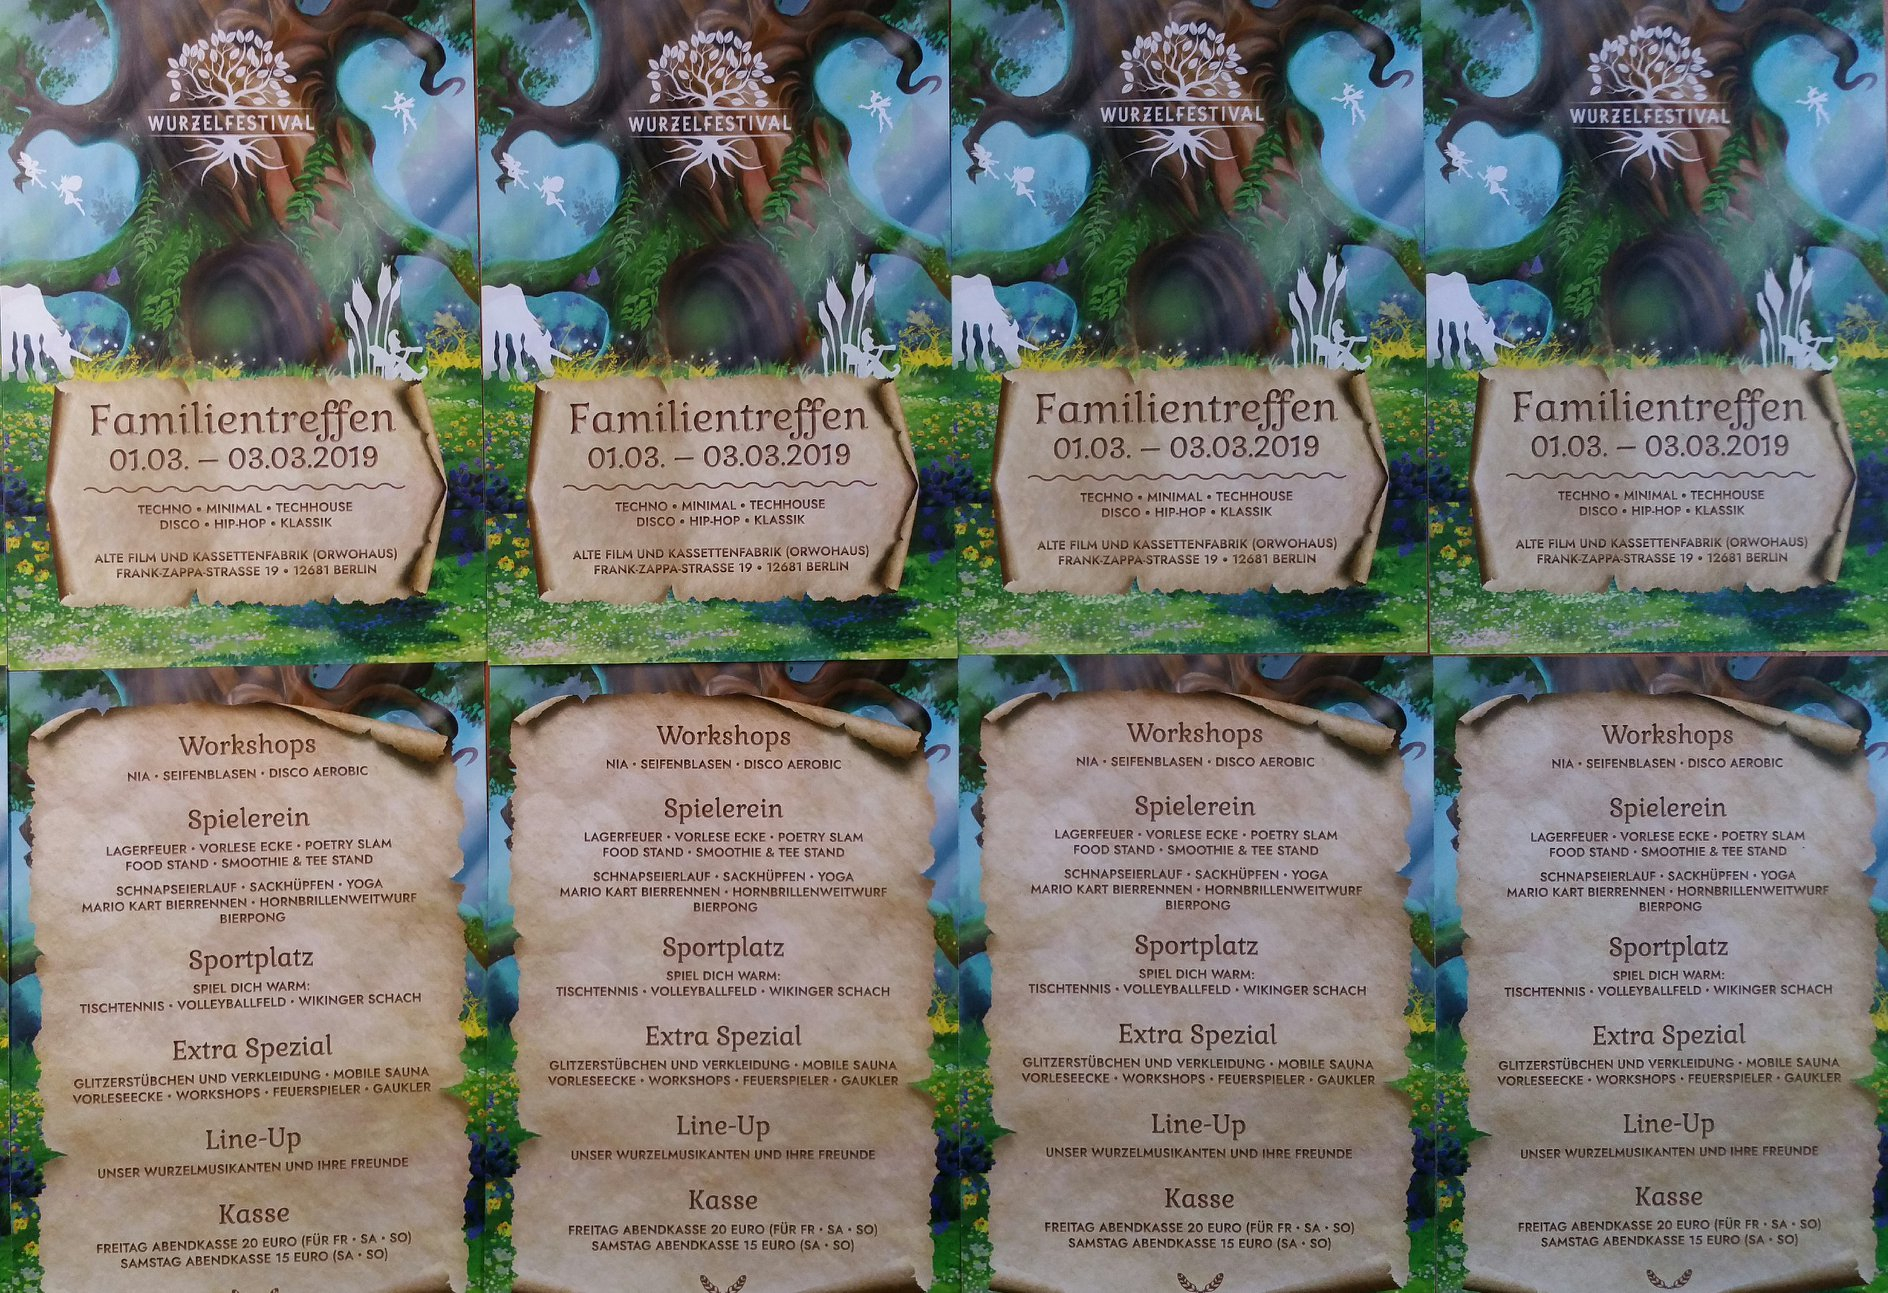 Zurück Zu Den Wurzeln Festival Familientreffen 1 303 Wurzelfestival